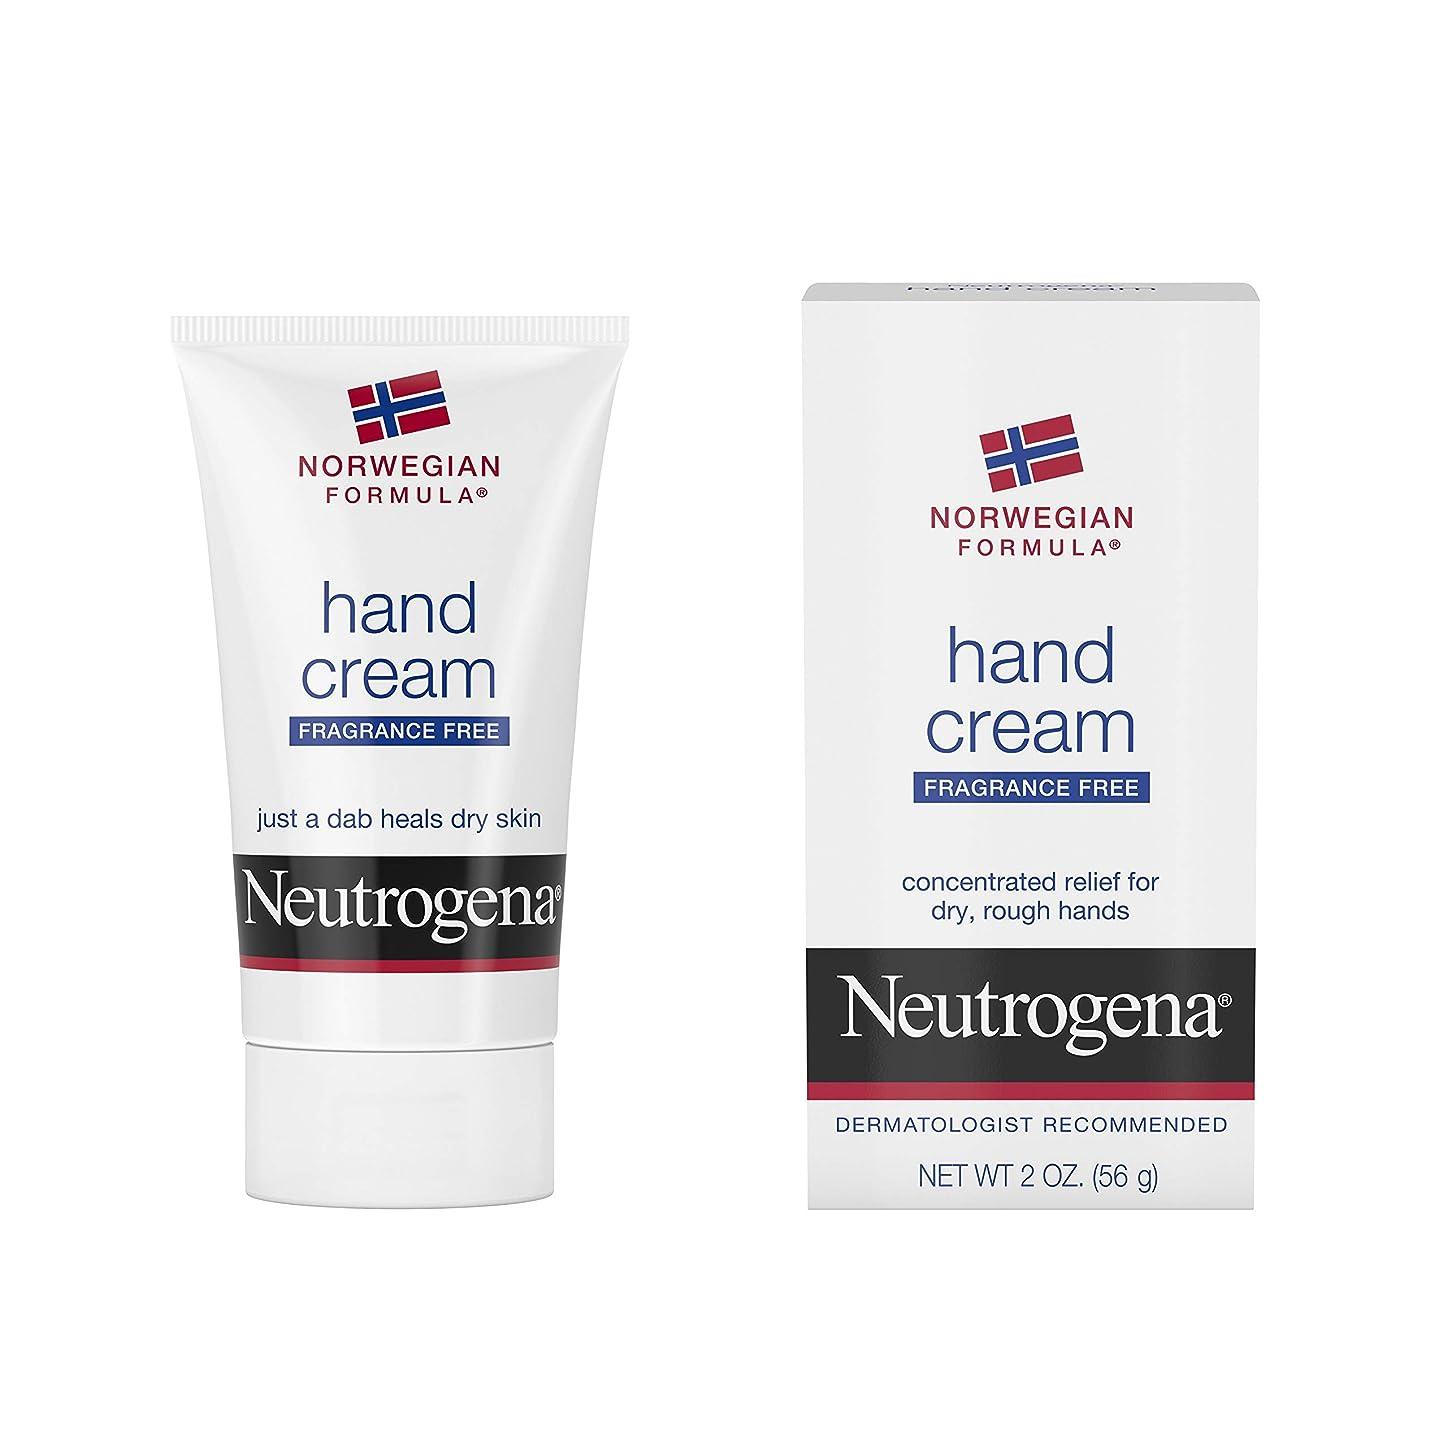 青社会主義者子猫Neutrogena Norwegian Formula Hand Cream Fragrance-Free 60 ml (並行輸入品)